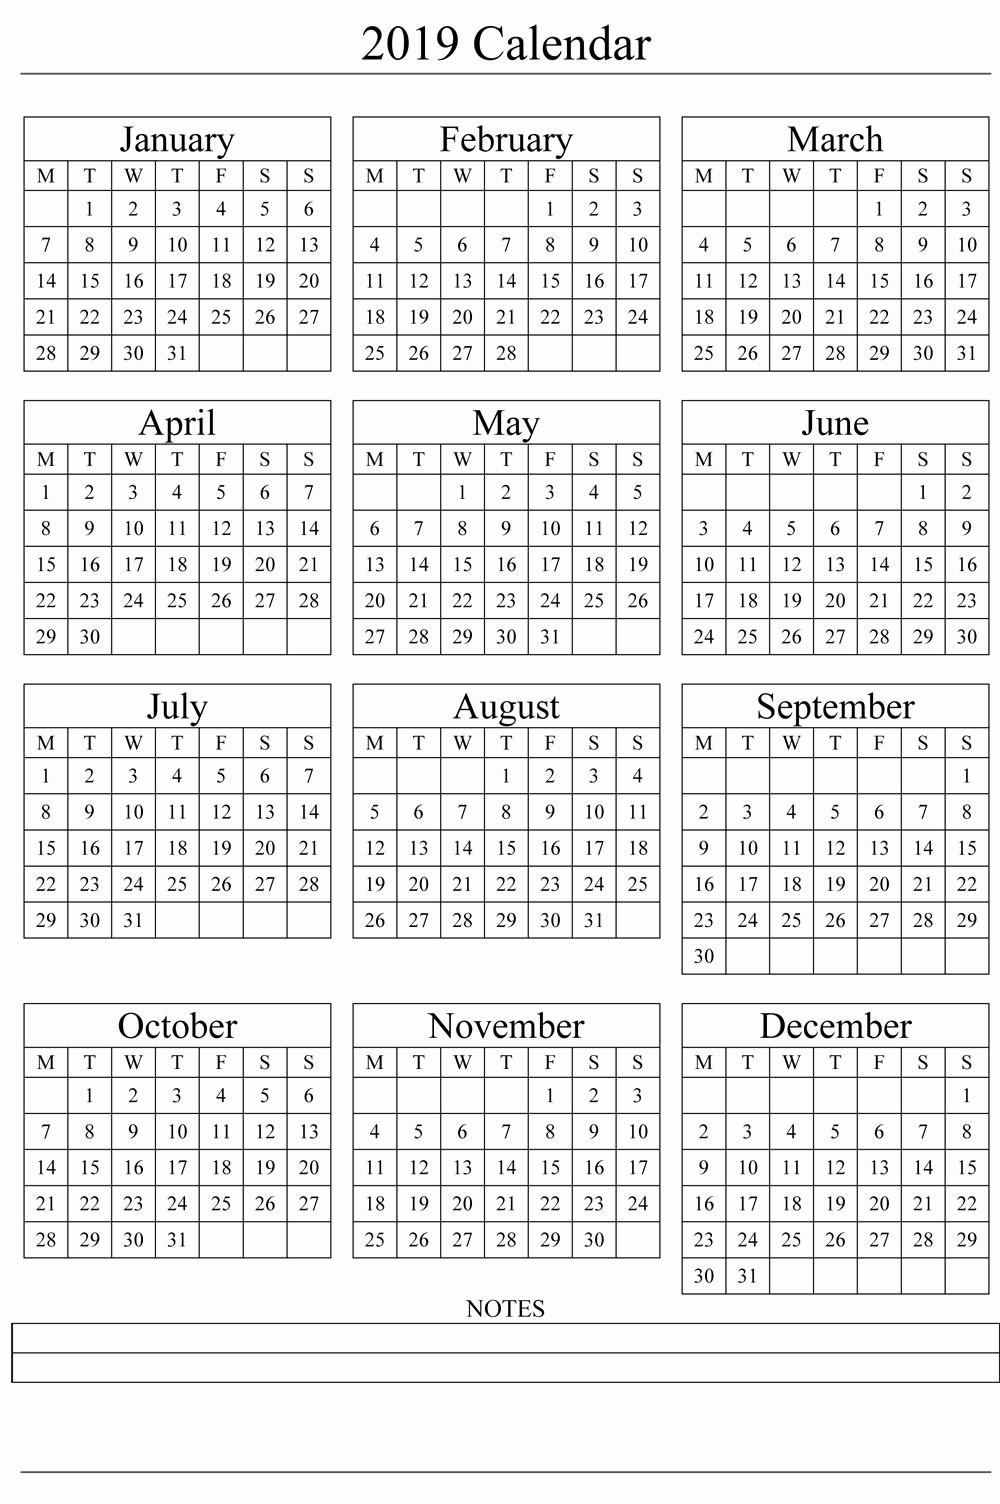 Printable 2018 and 2019 Calendar Lovely 2019 Printable Calendar Templates [free]